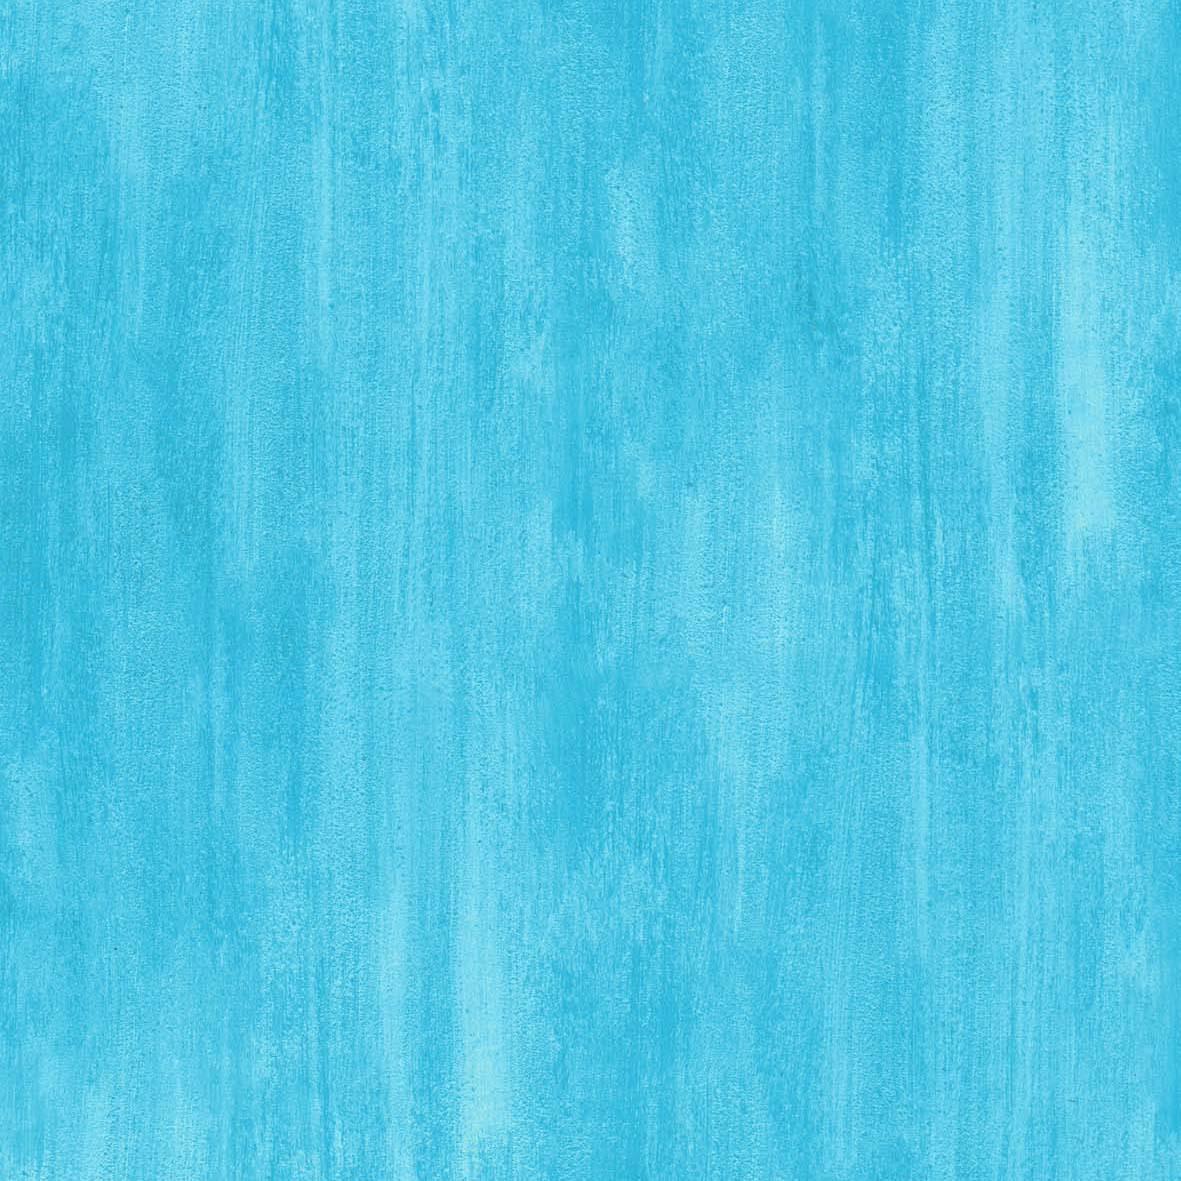 Papel mural vinilizado amarie 38 5 cinthiasa for Colocar papel mural